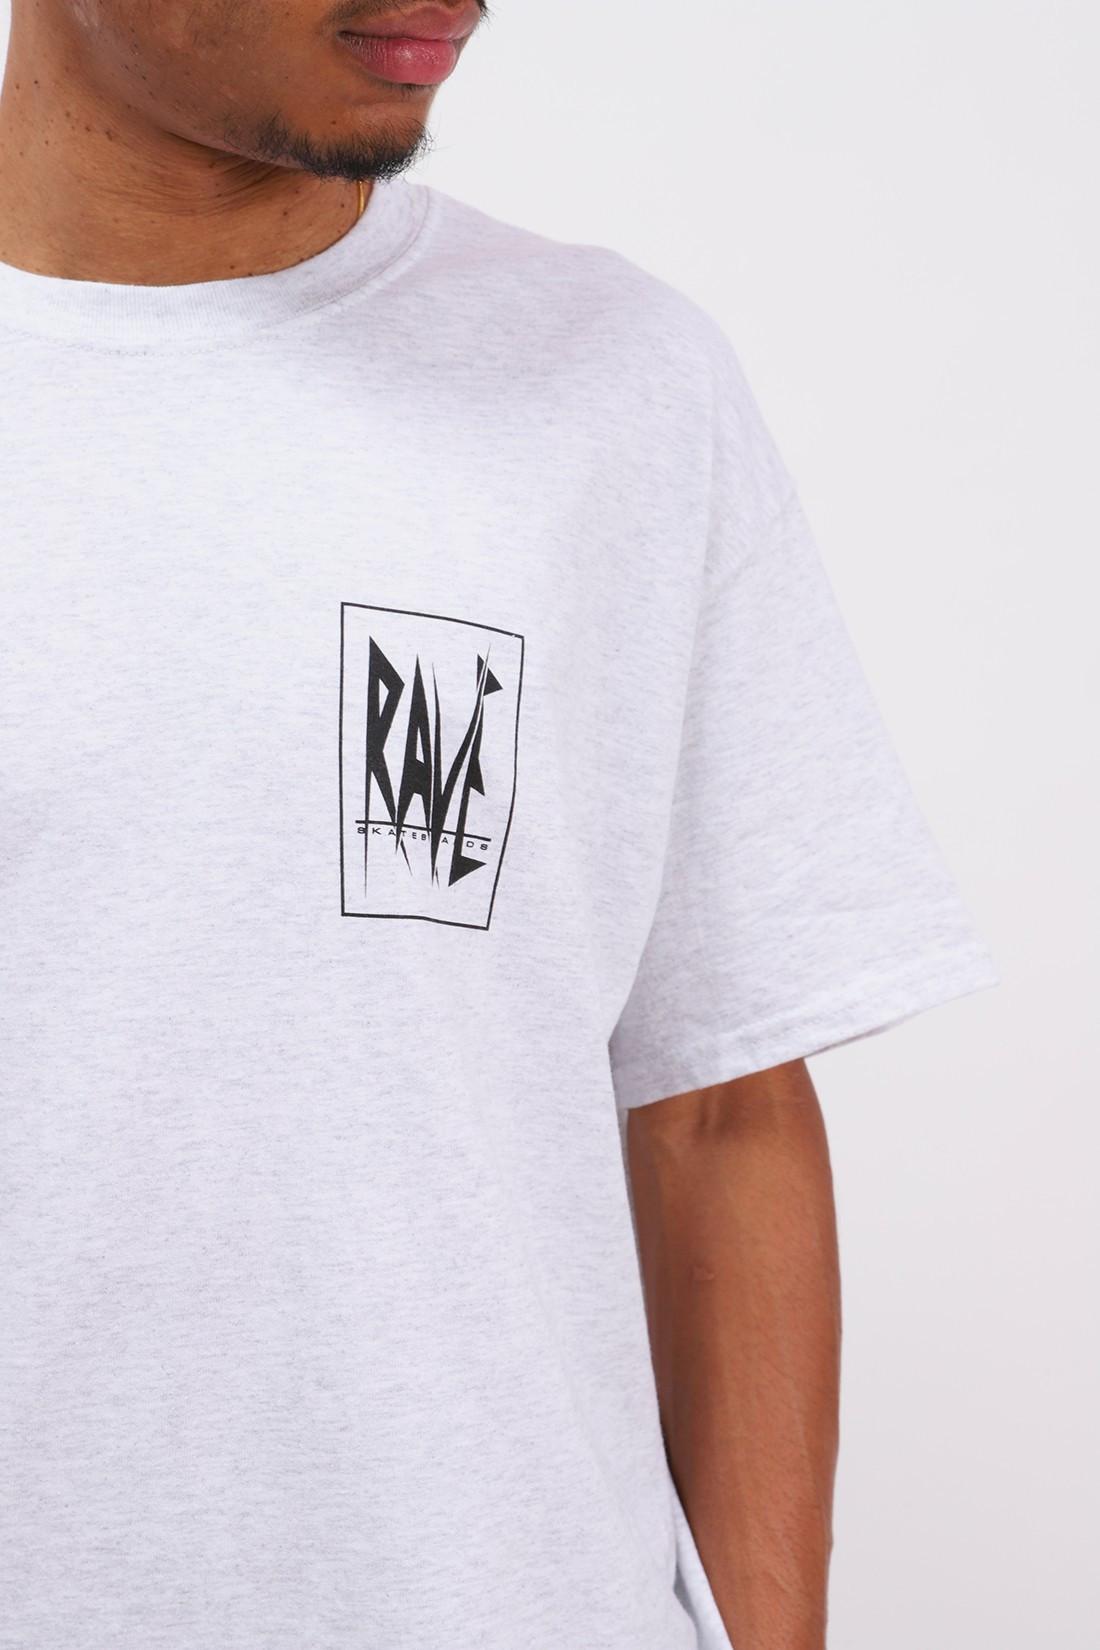 RAVE / Rave sanary tee Ash grey